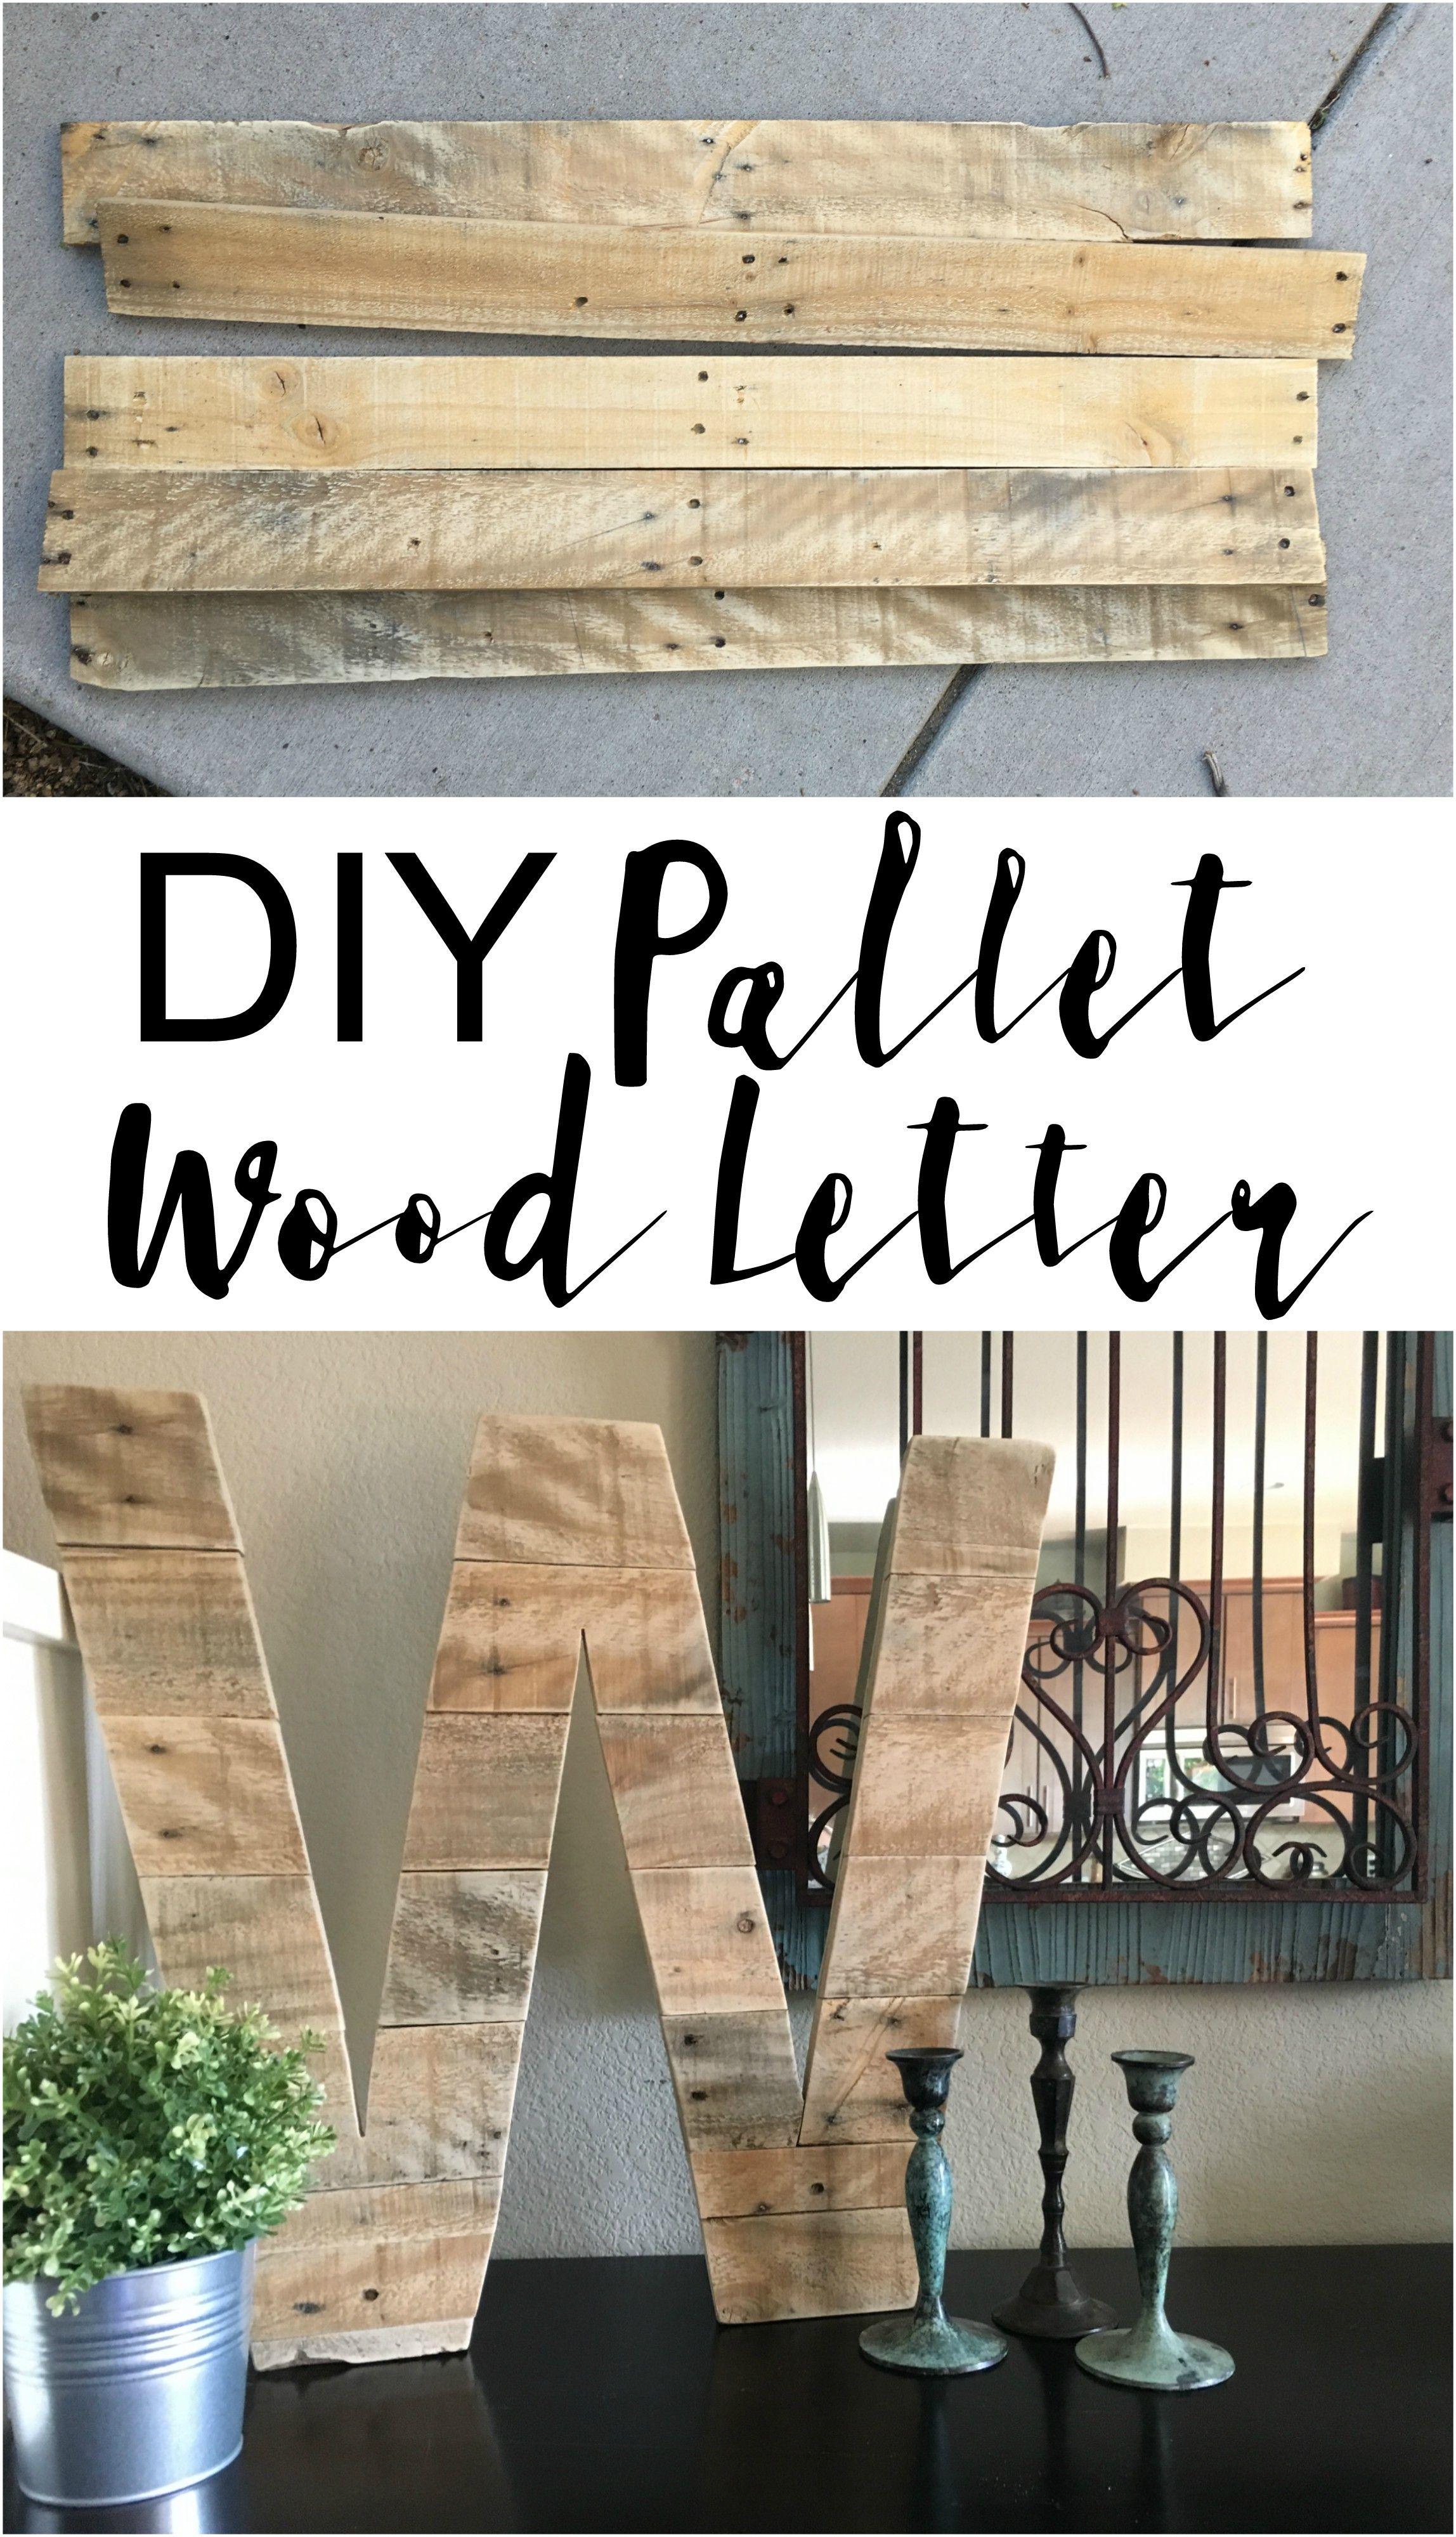 diy pallet wood letter large letters pallet wood and pallet projects. Black Bedroom Furniture Sets. Home Design Ideas